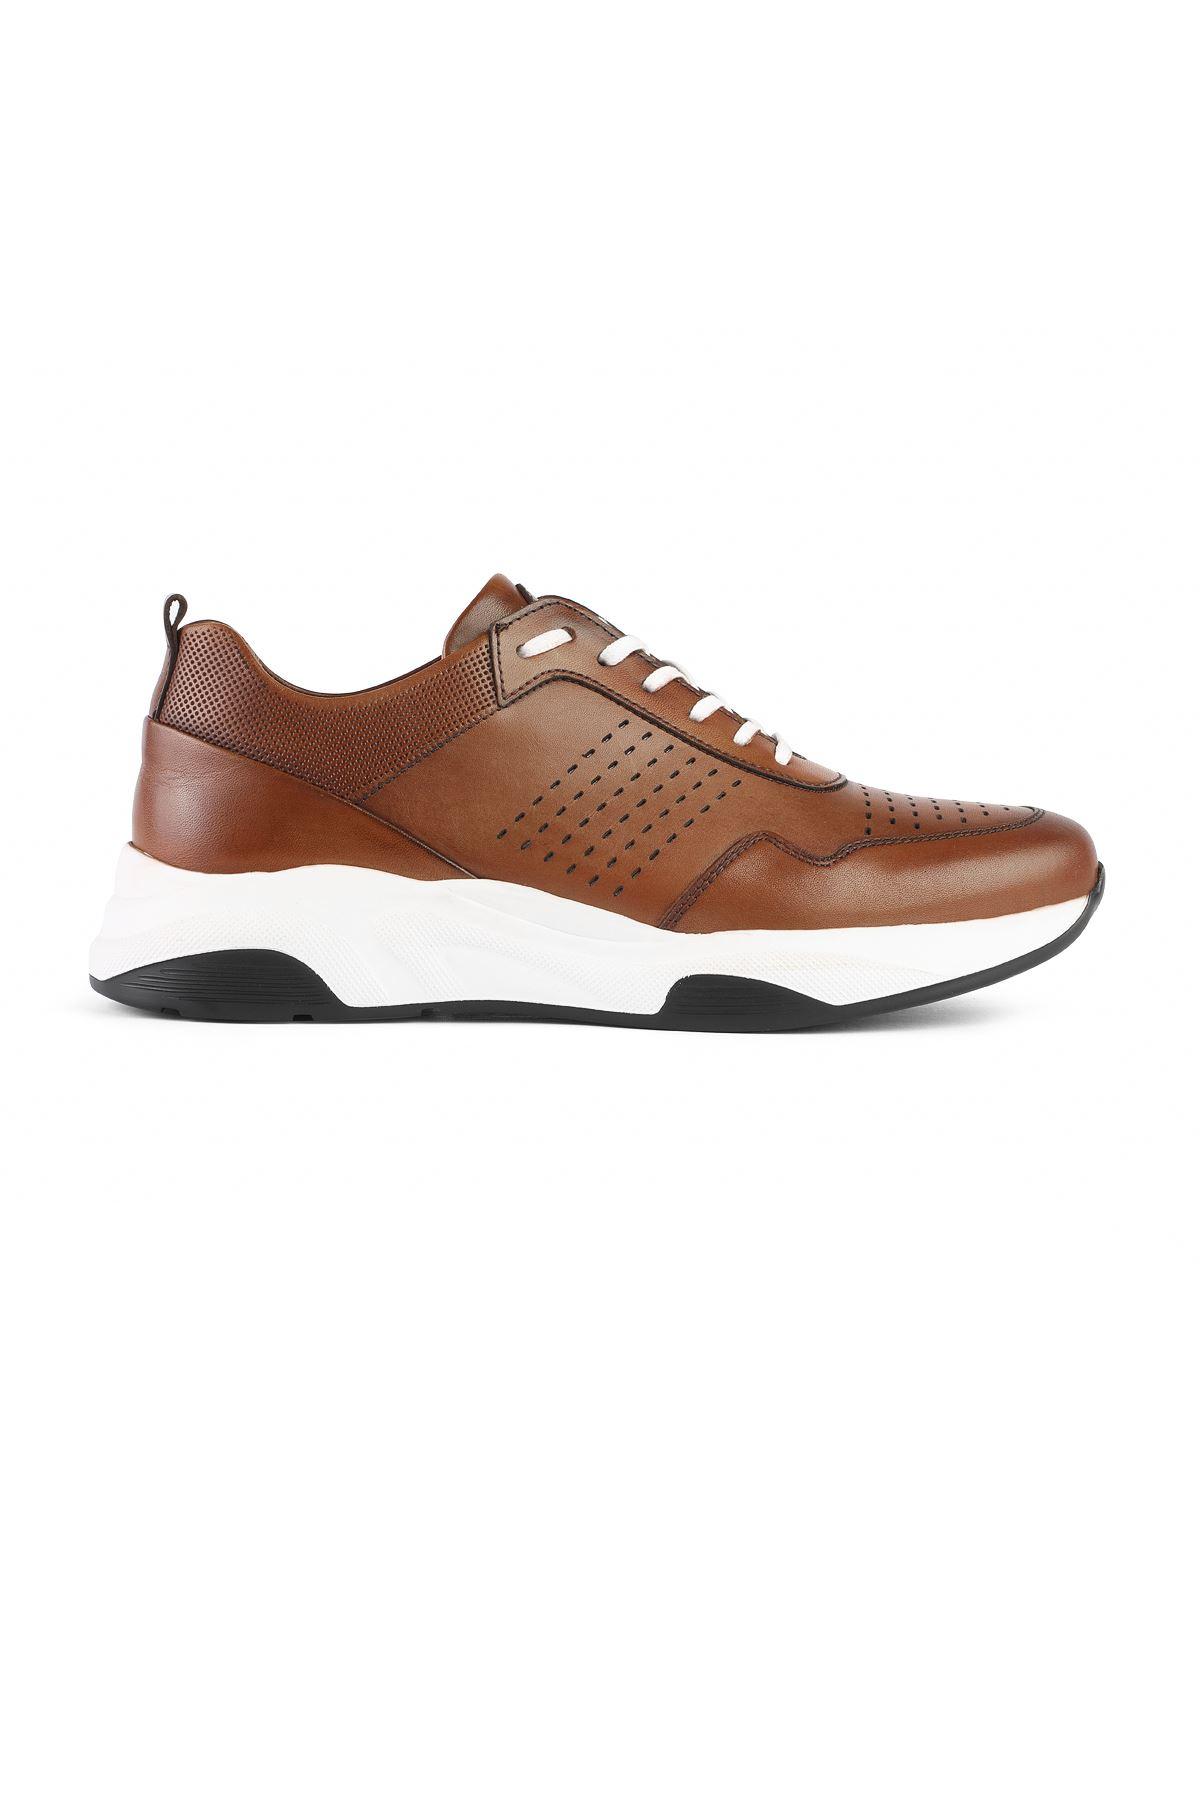 Libero 3313 Tan Sport Shoes